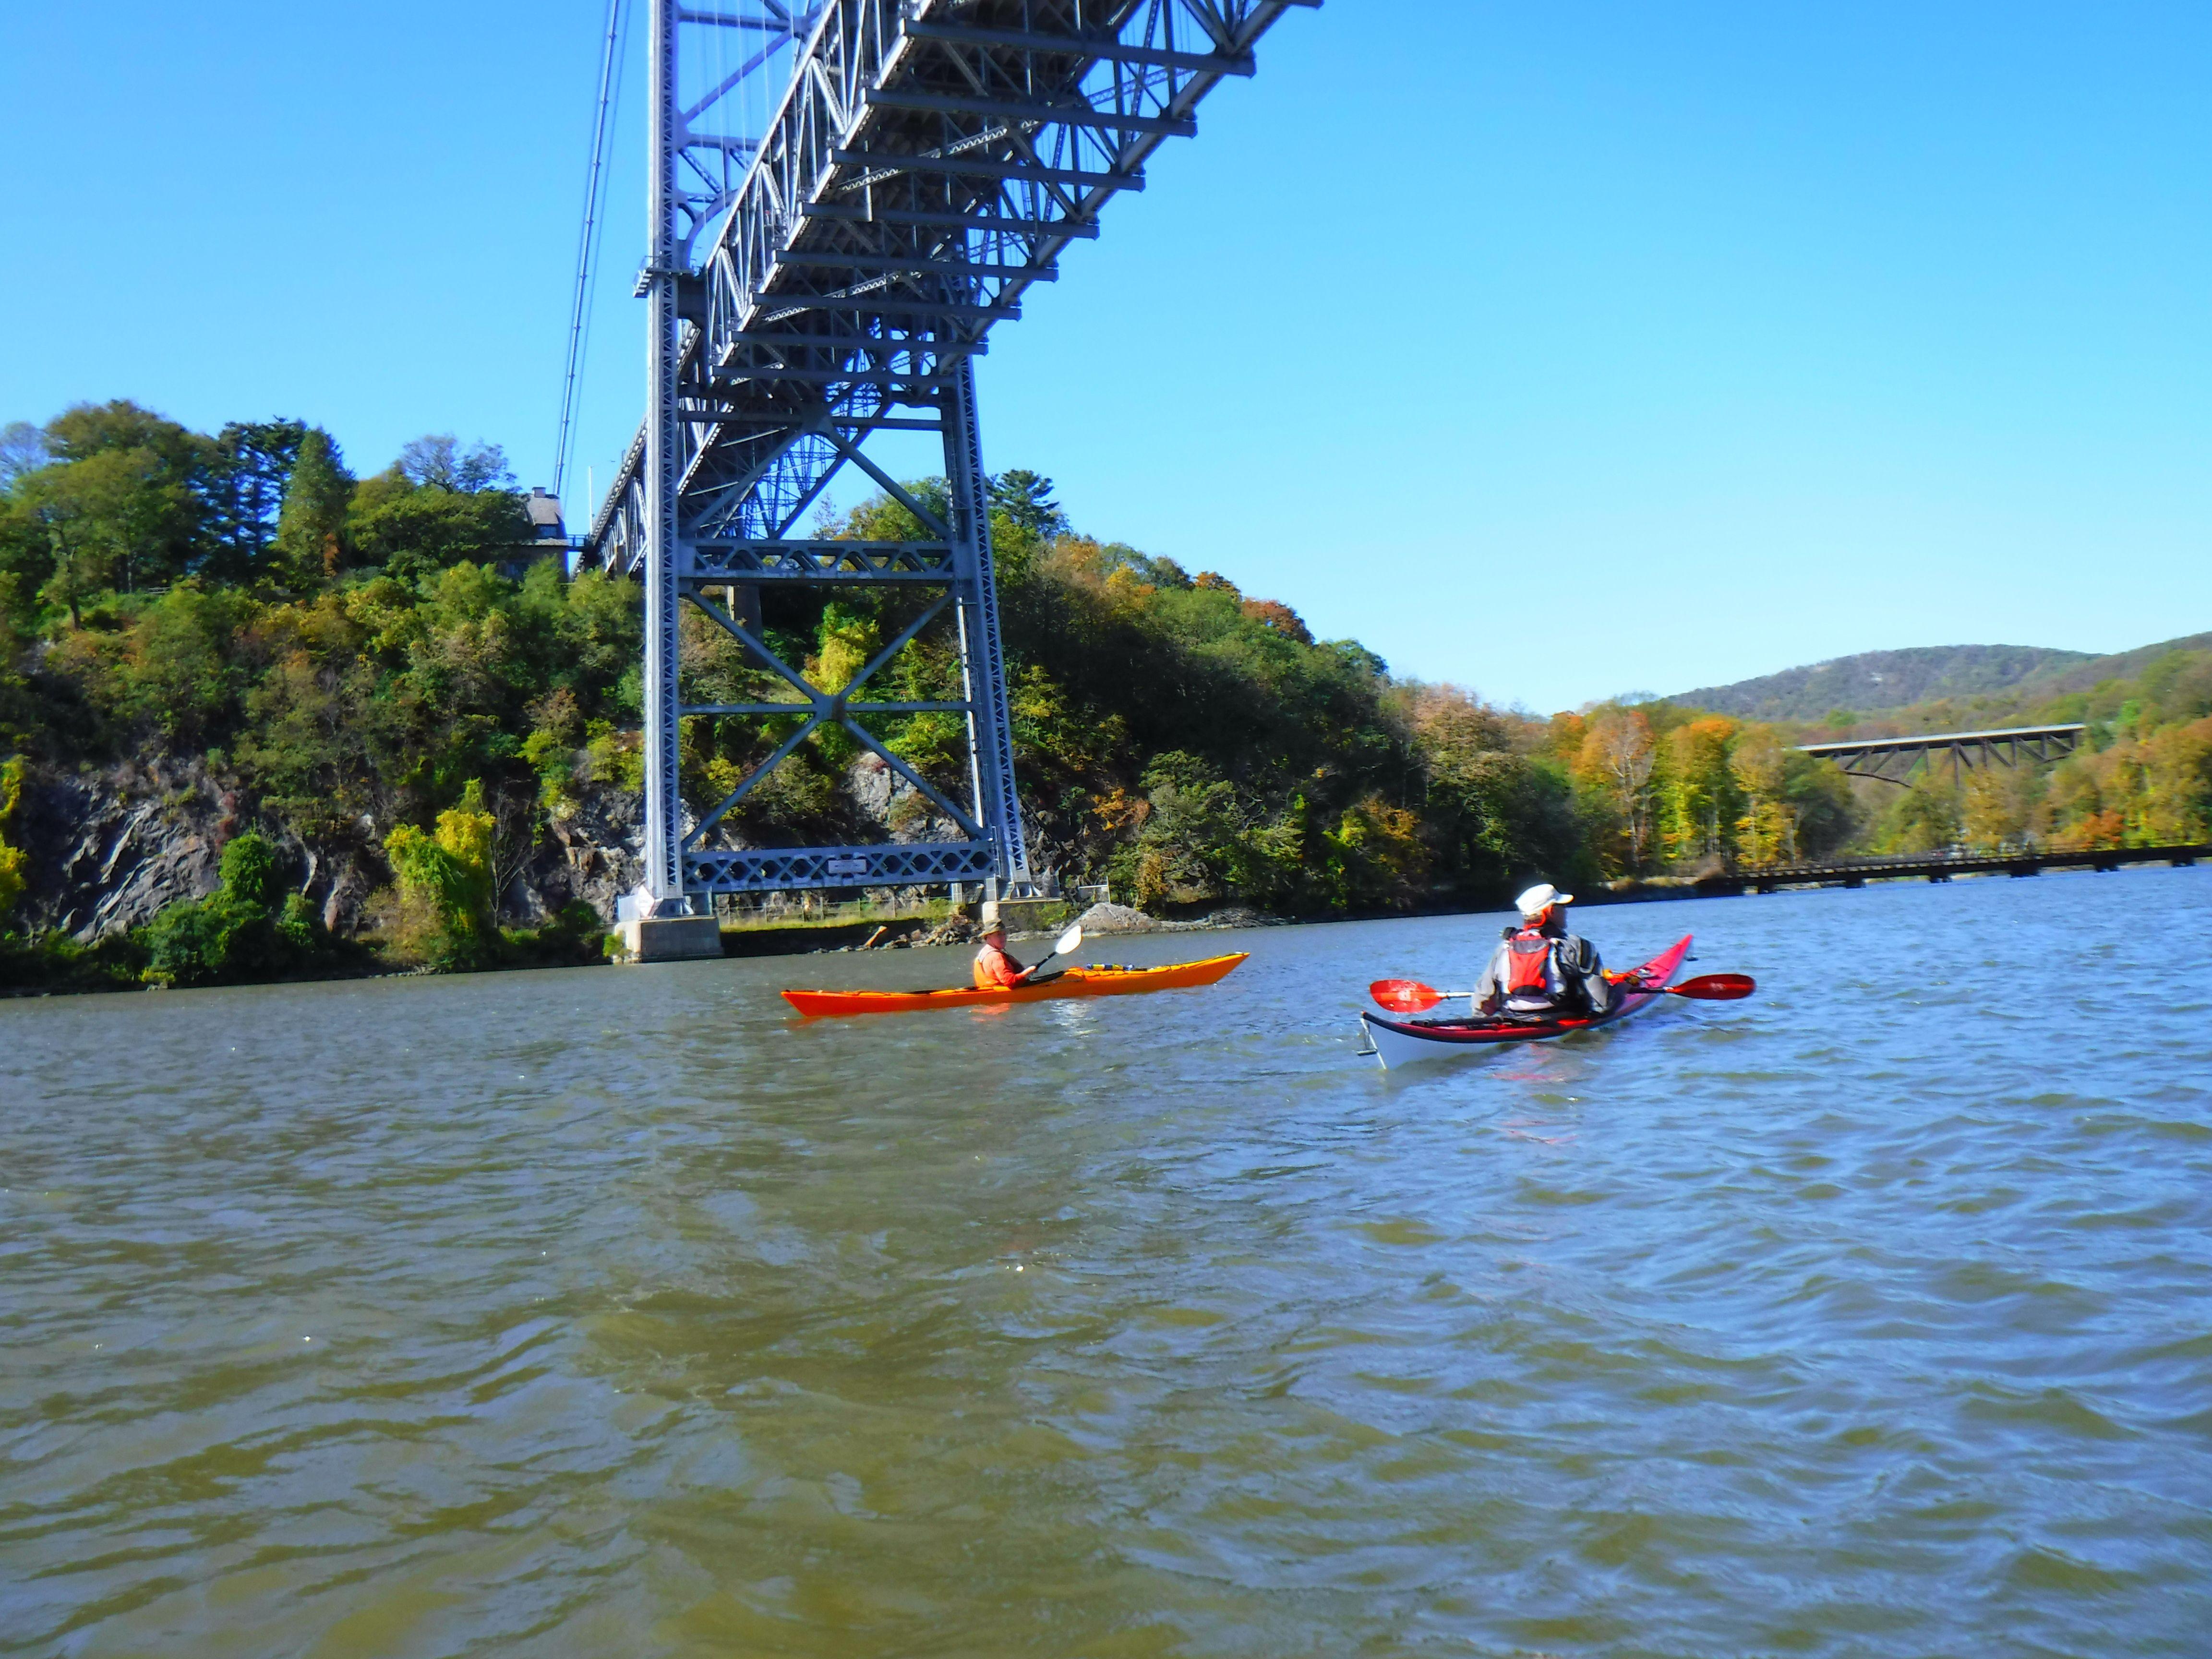 kayaking the liquid skies